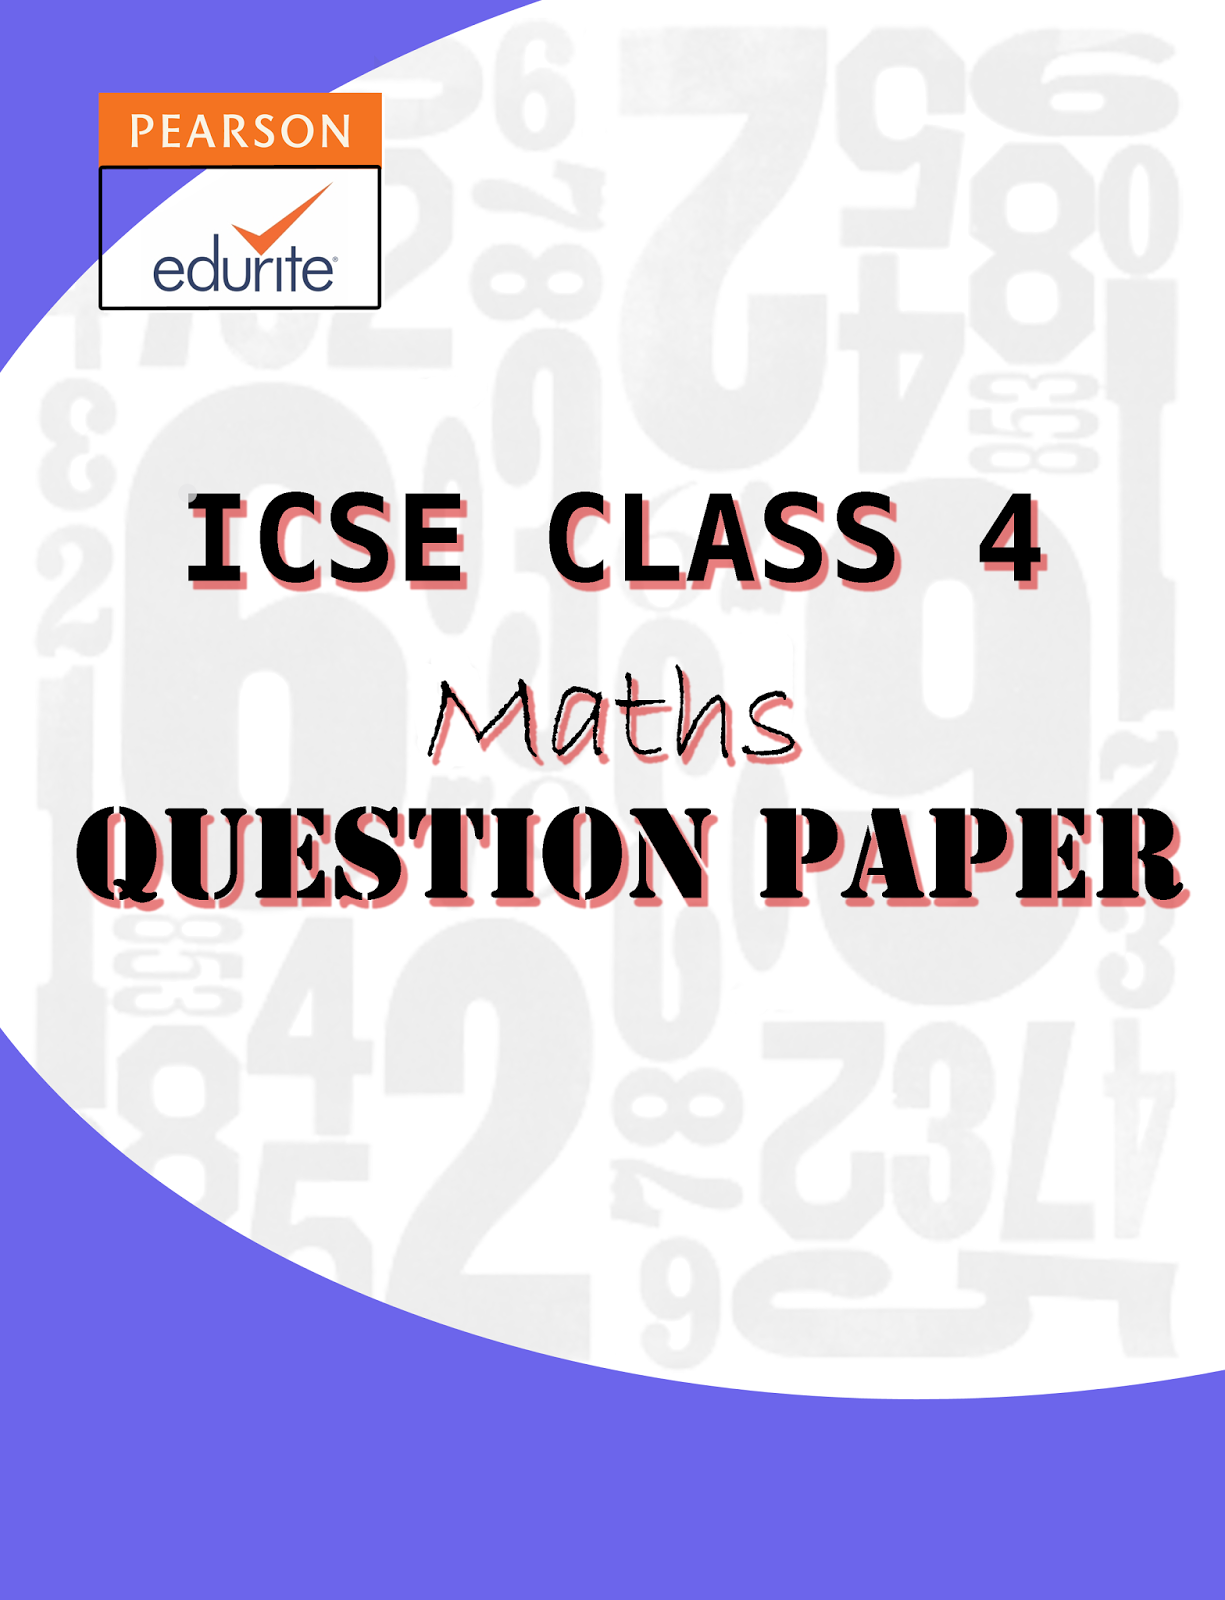 Icse Question Paper Pdf